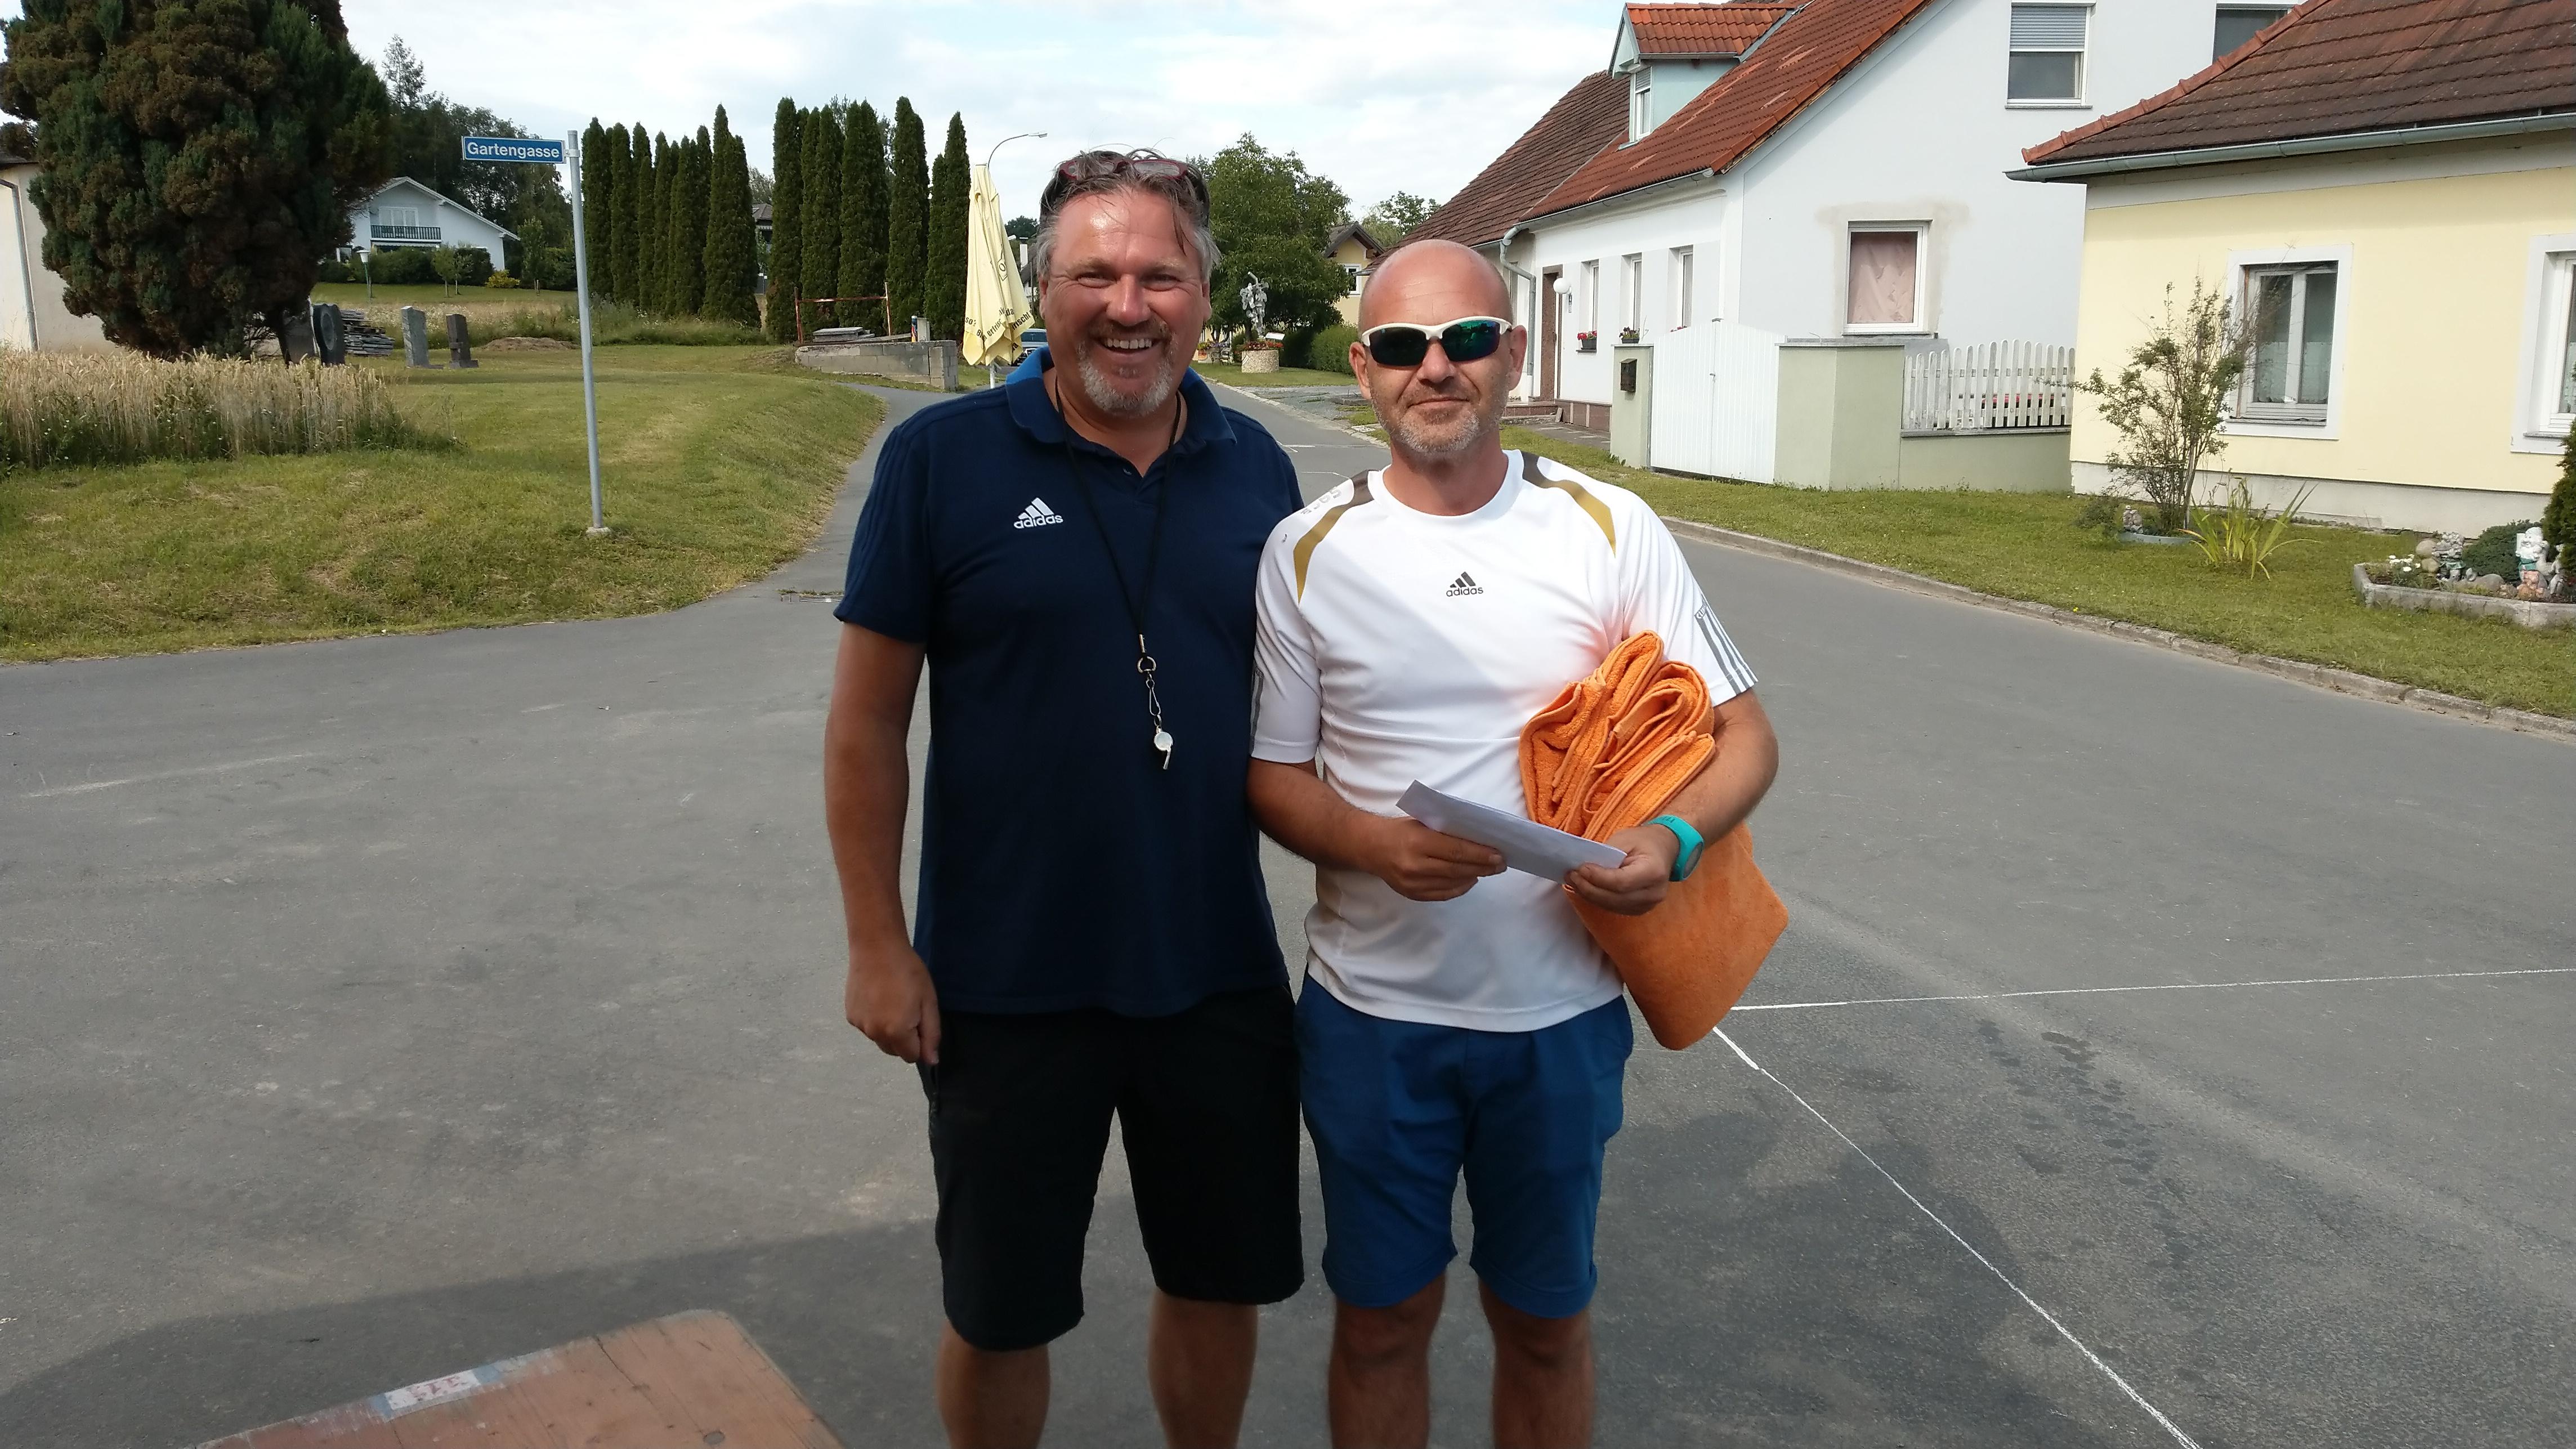 ESV_Eltendorf_-_Hobbyturnier_-_2018-06-23 (40)